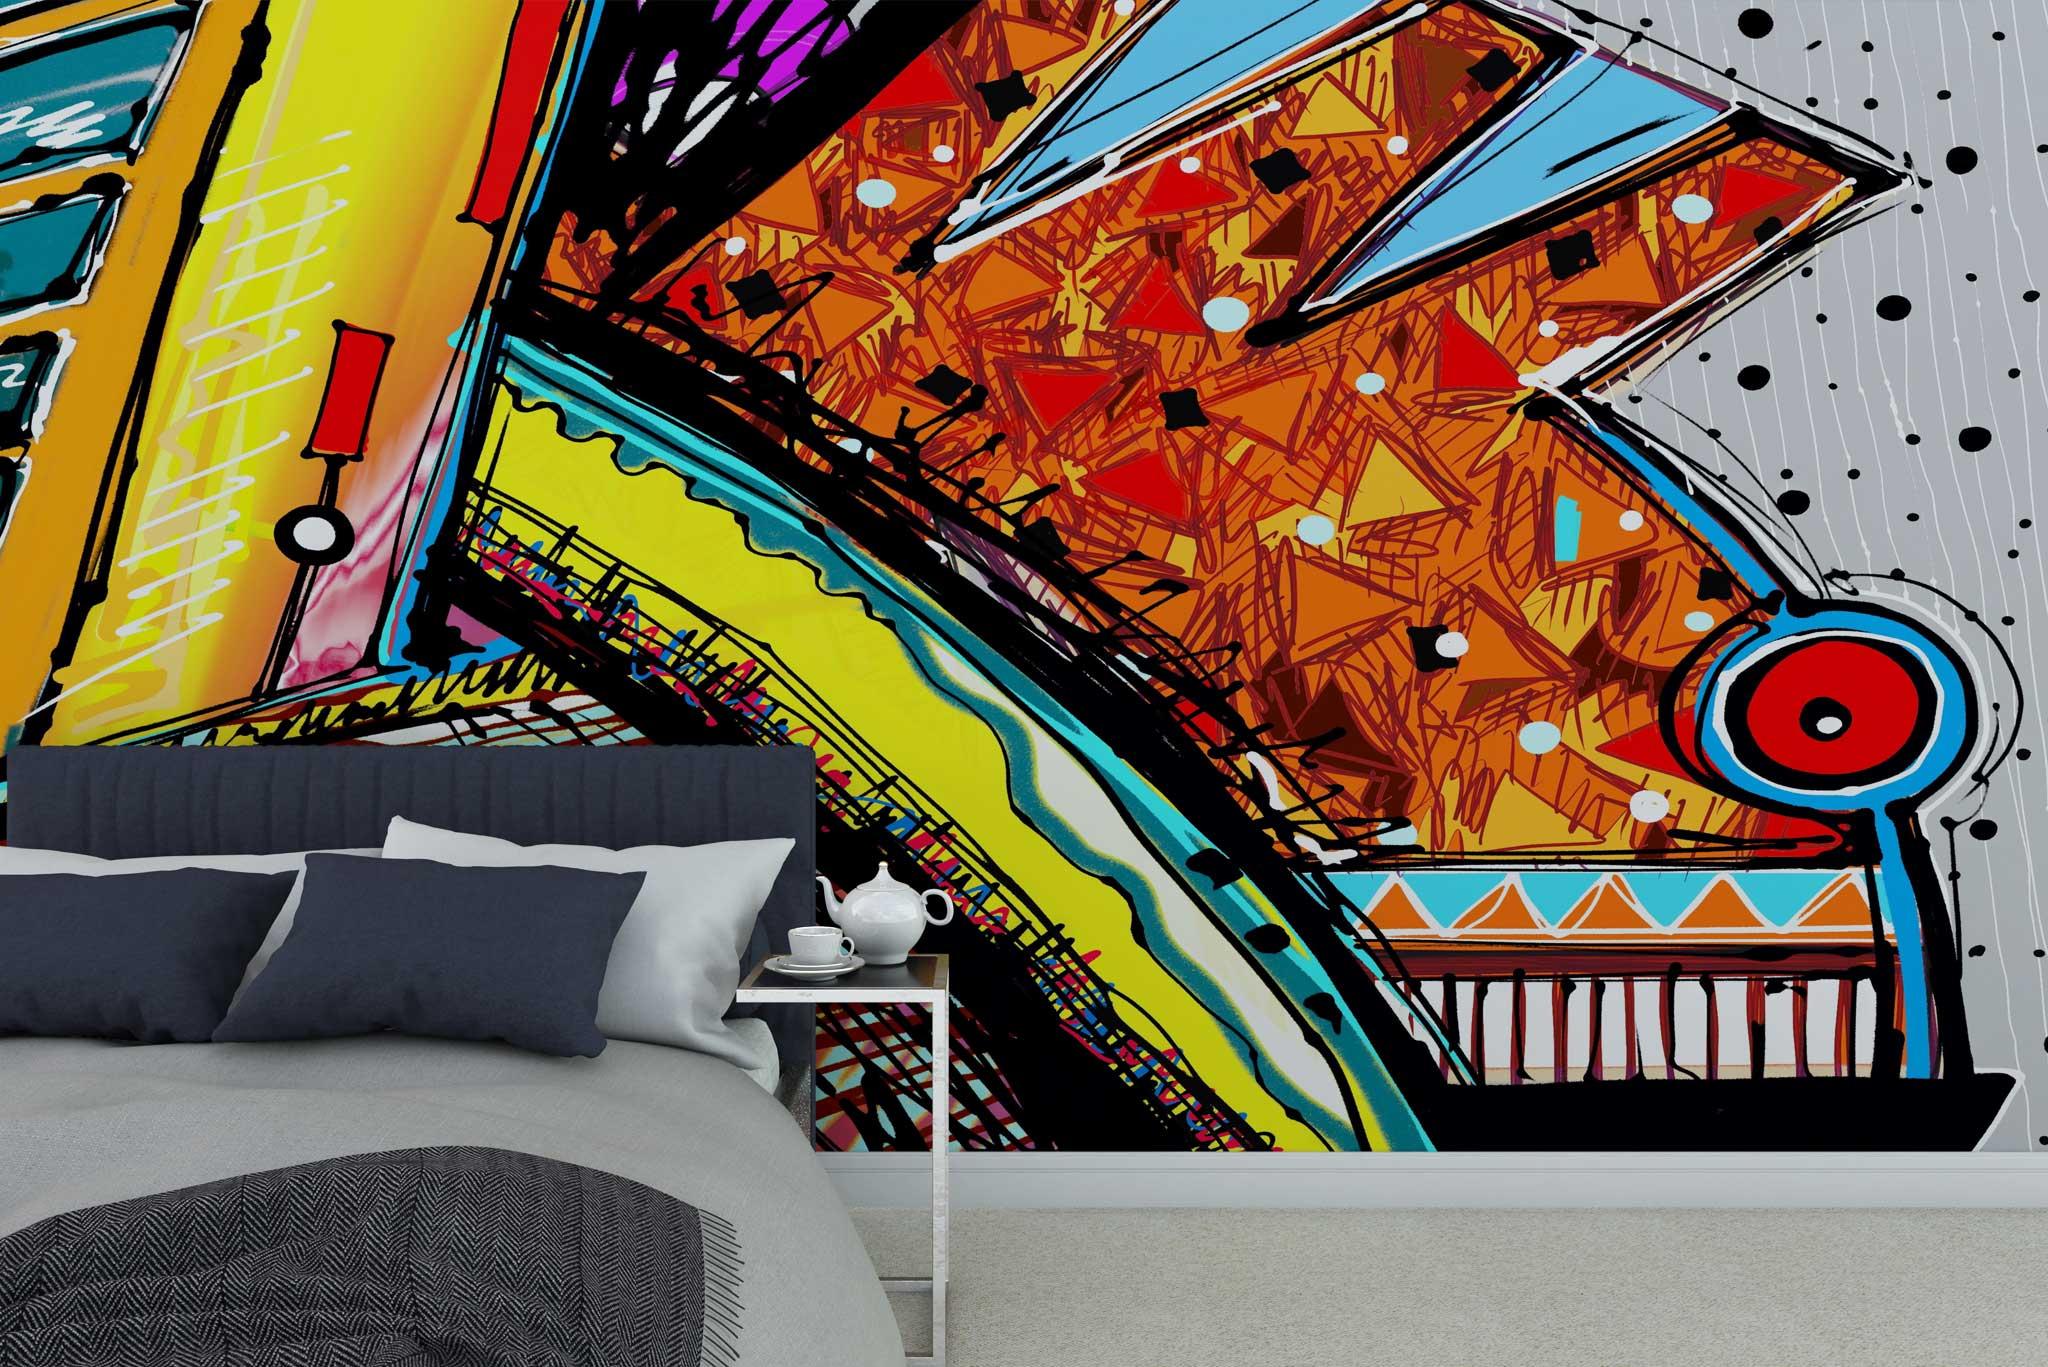 tapet-fototapet-special-personalizat-customizabil-comanda-bucuresti-daring-prints-model-graffitti-desen-mural-industrial-contemporan-multicolor